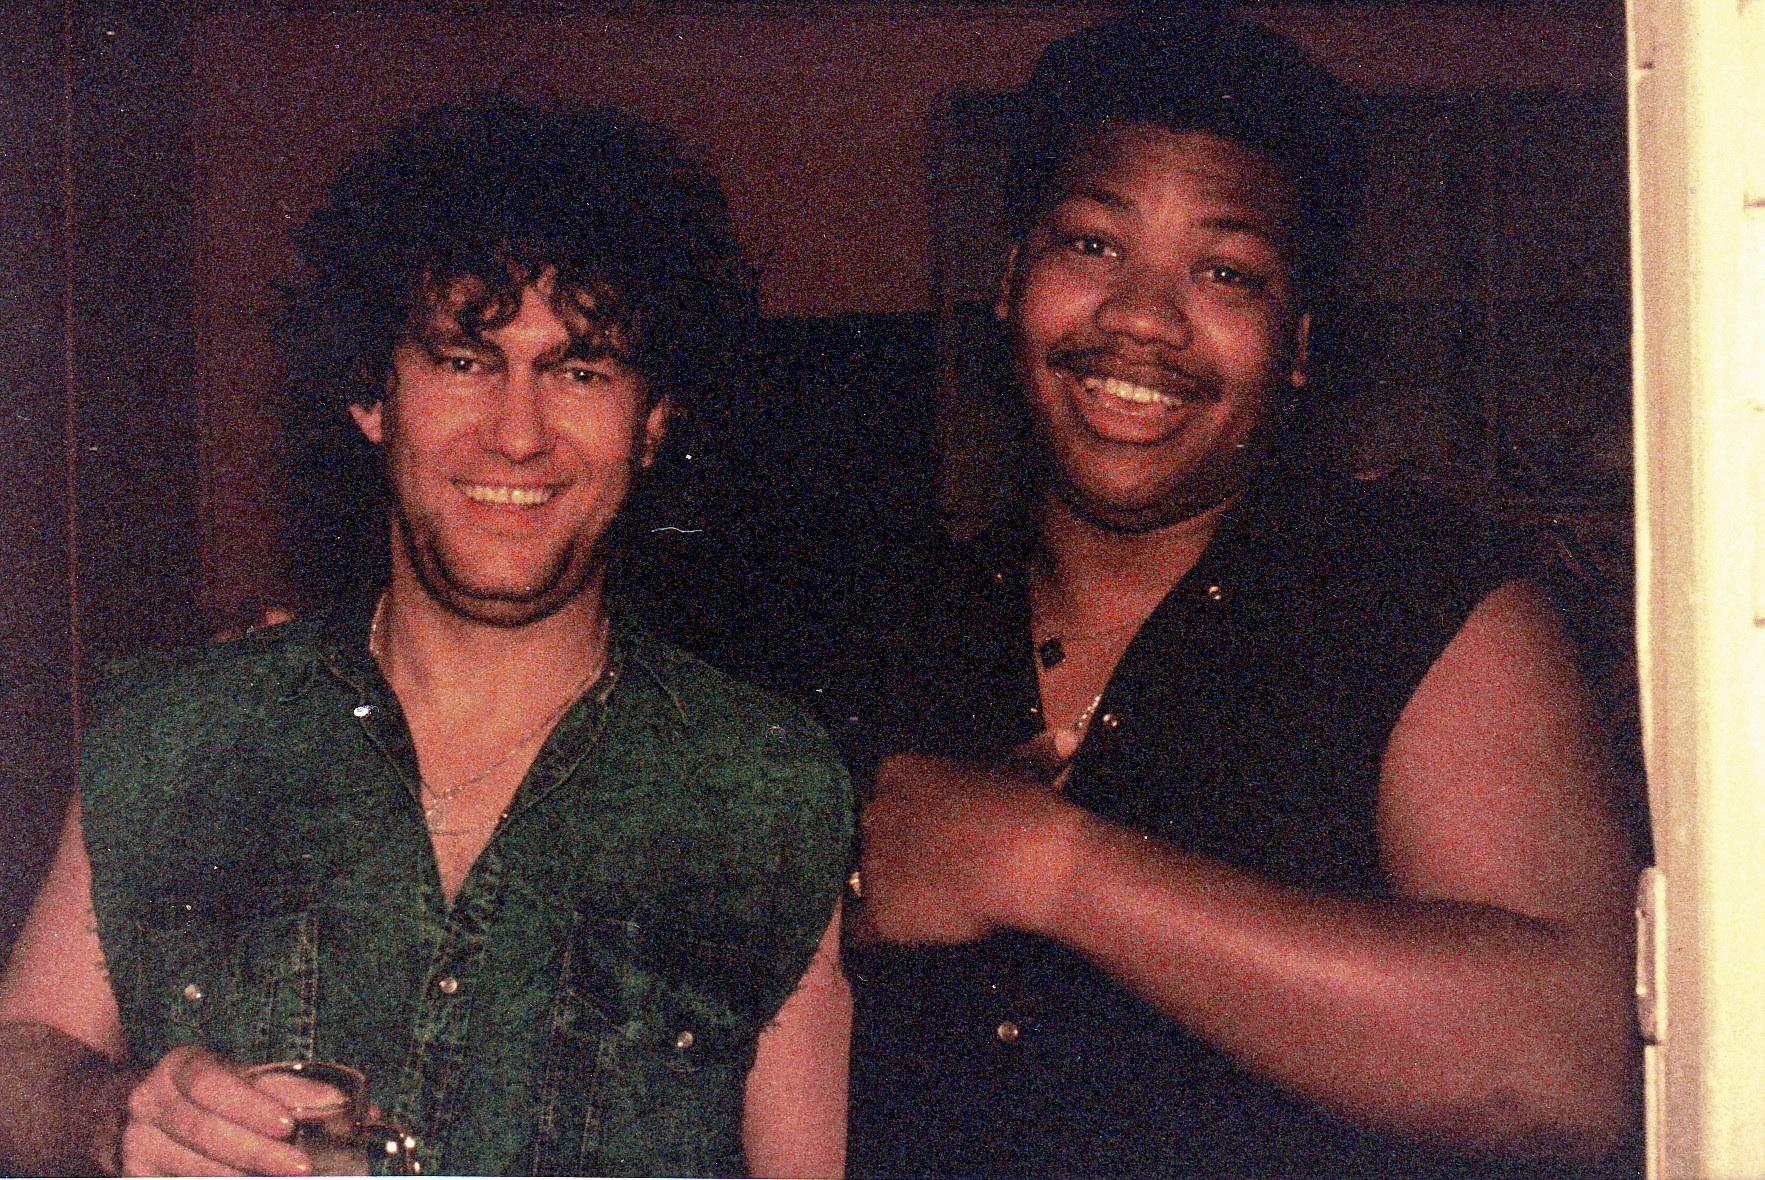 Jimmy Barnes 1992